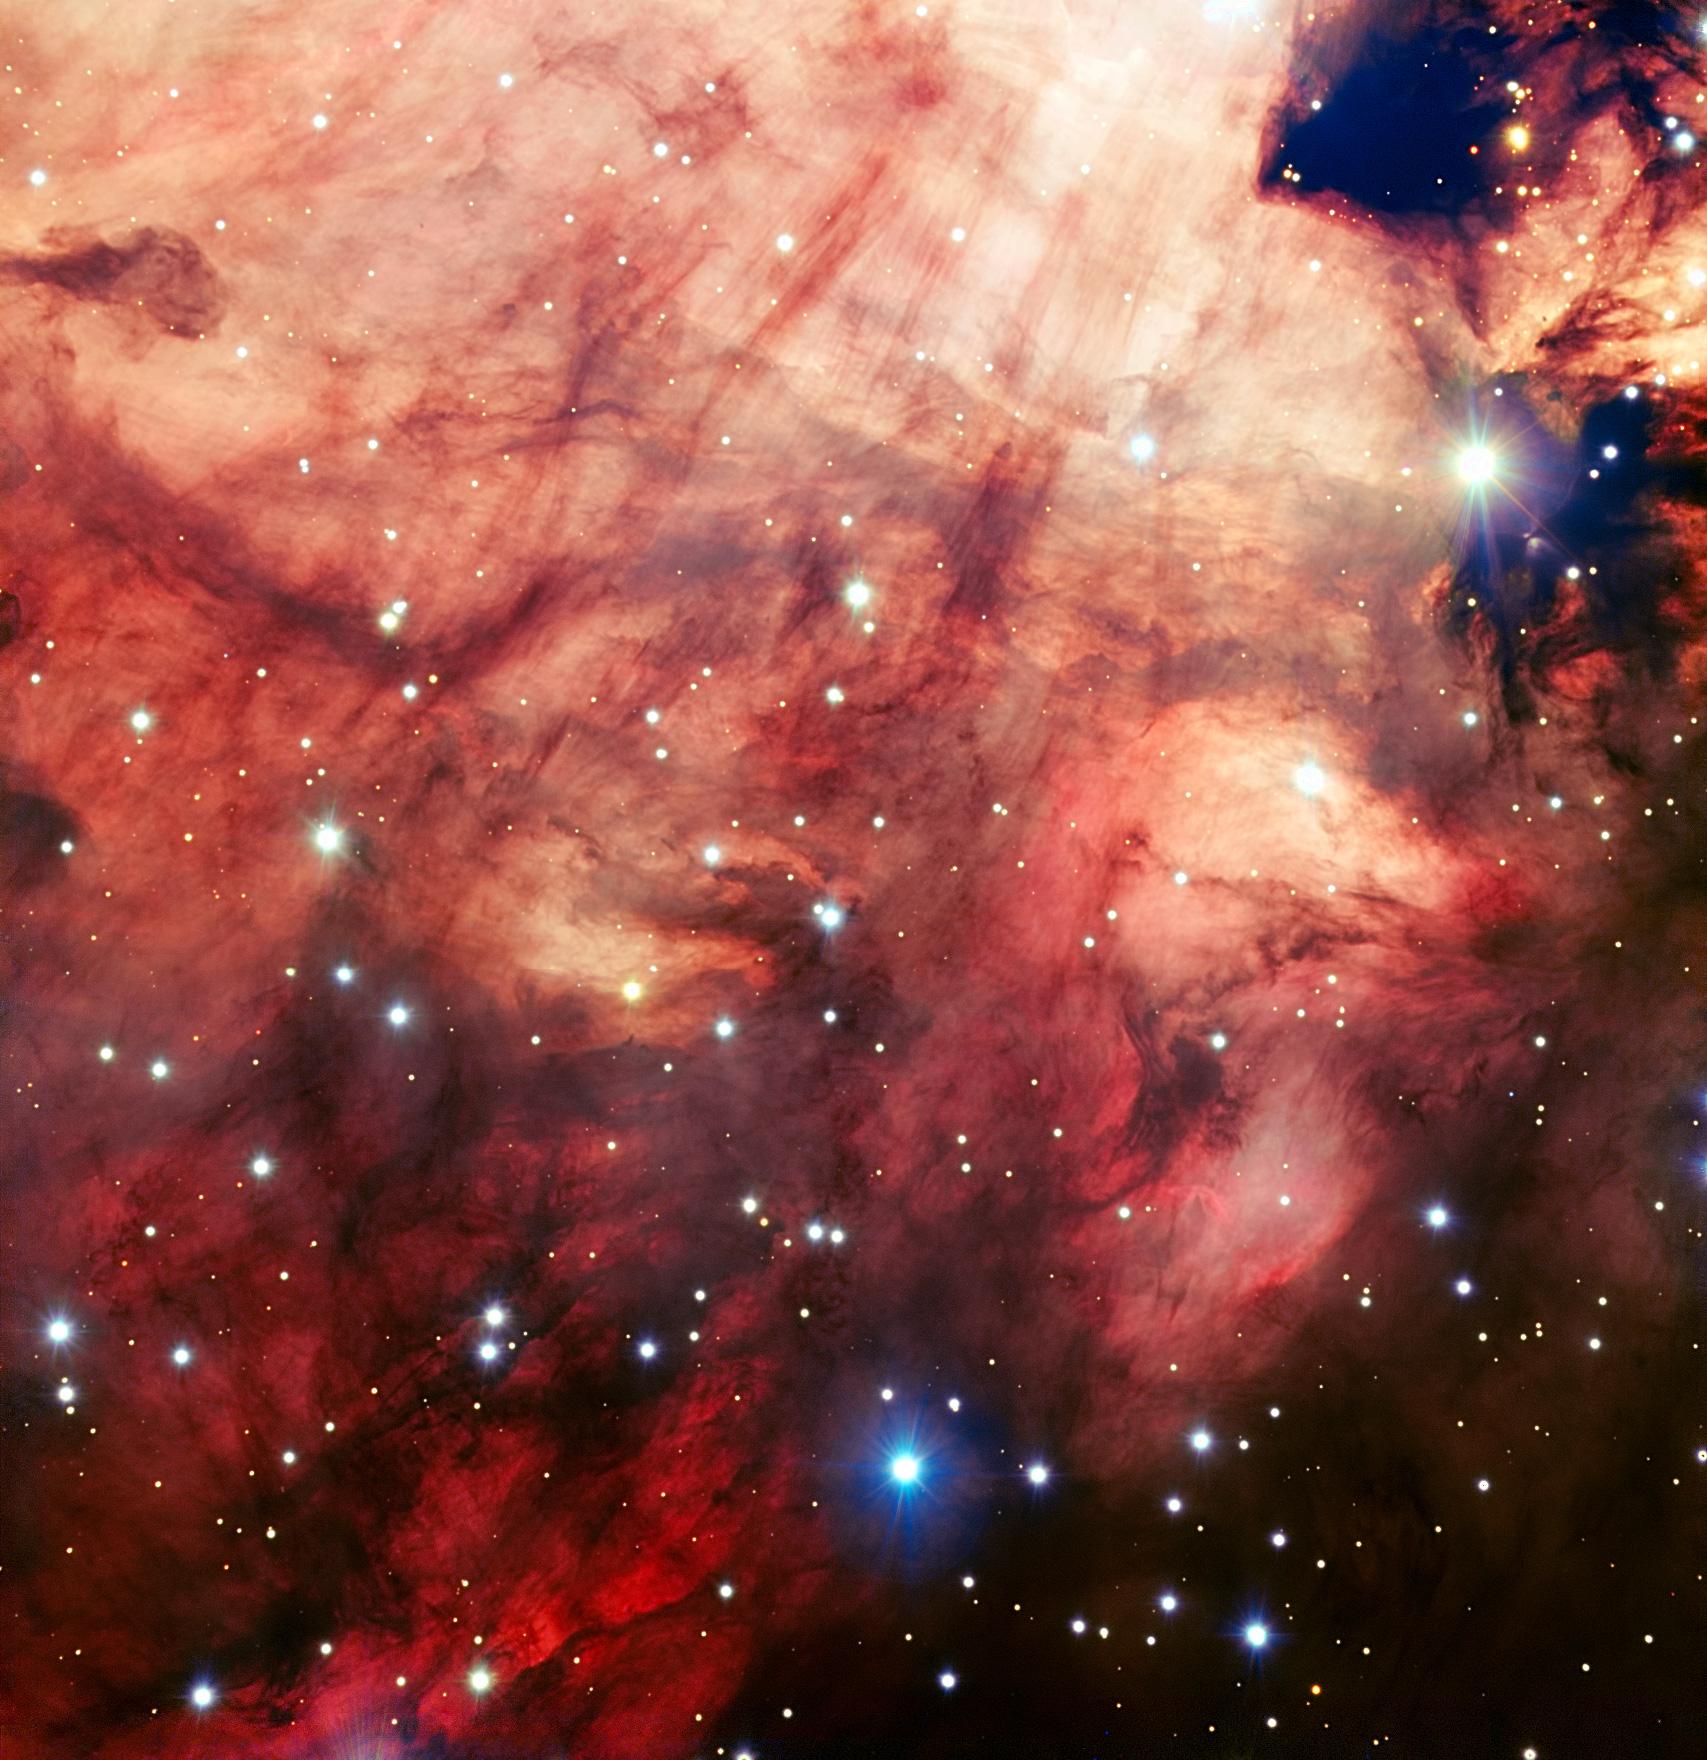 Omega Nebula's Bright Pink Heart